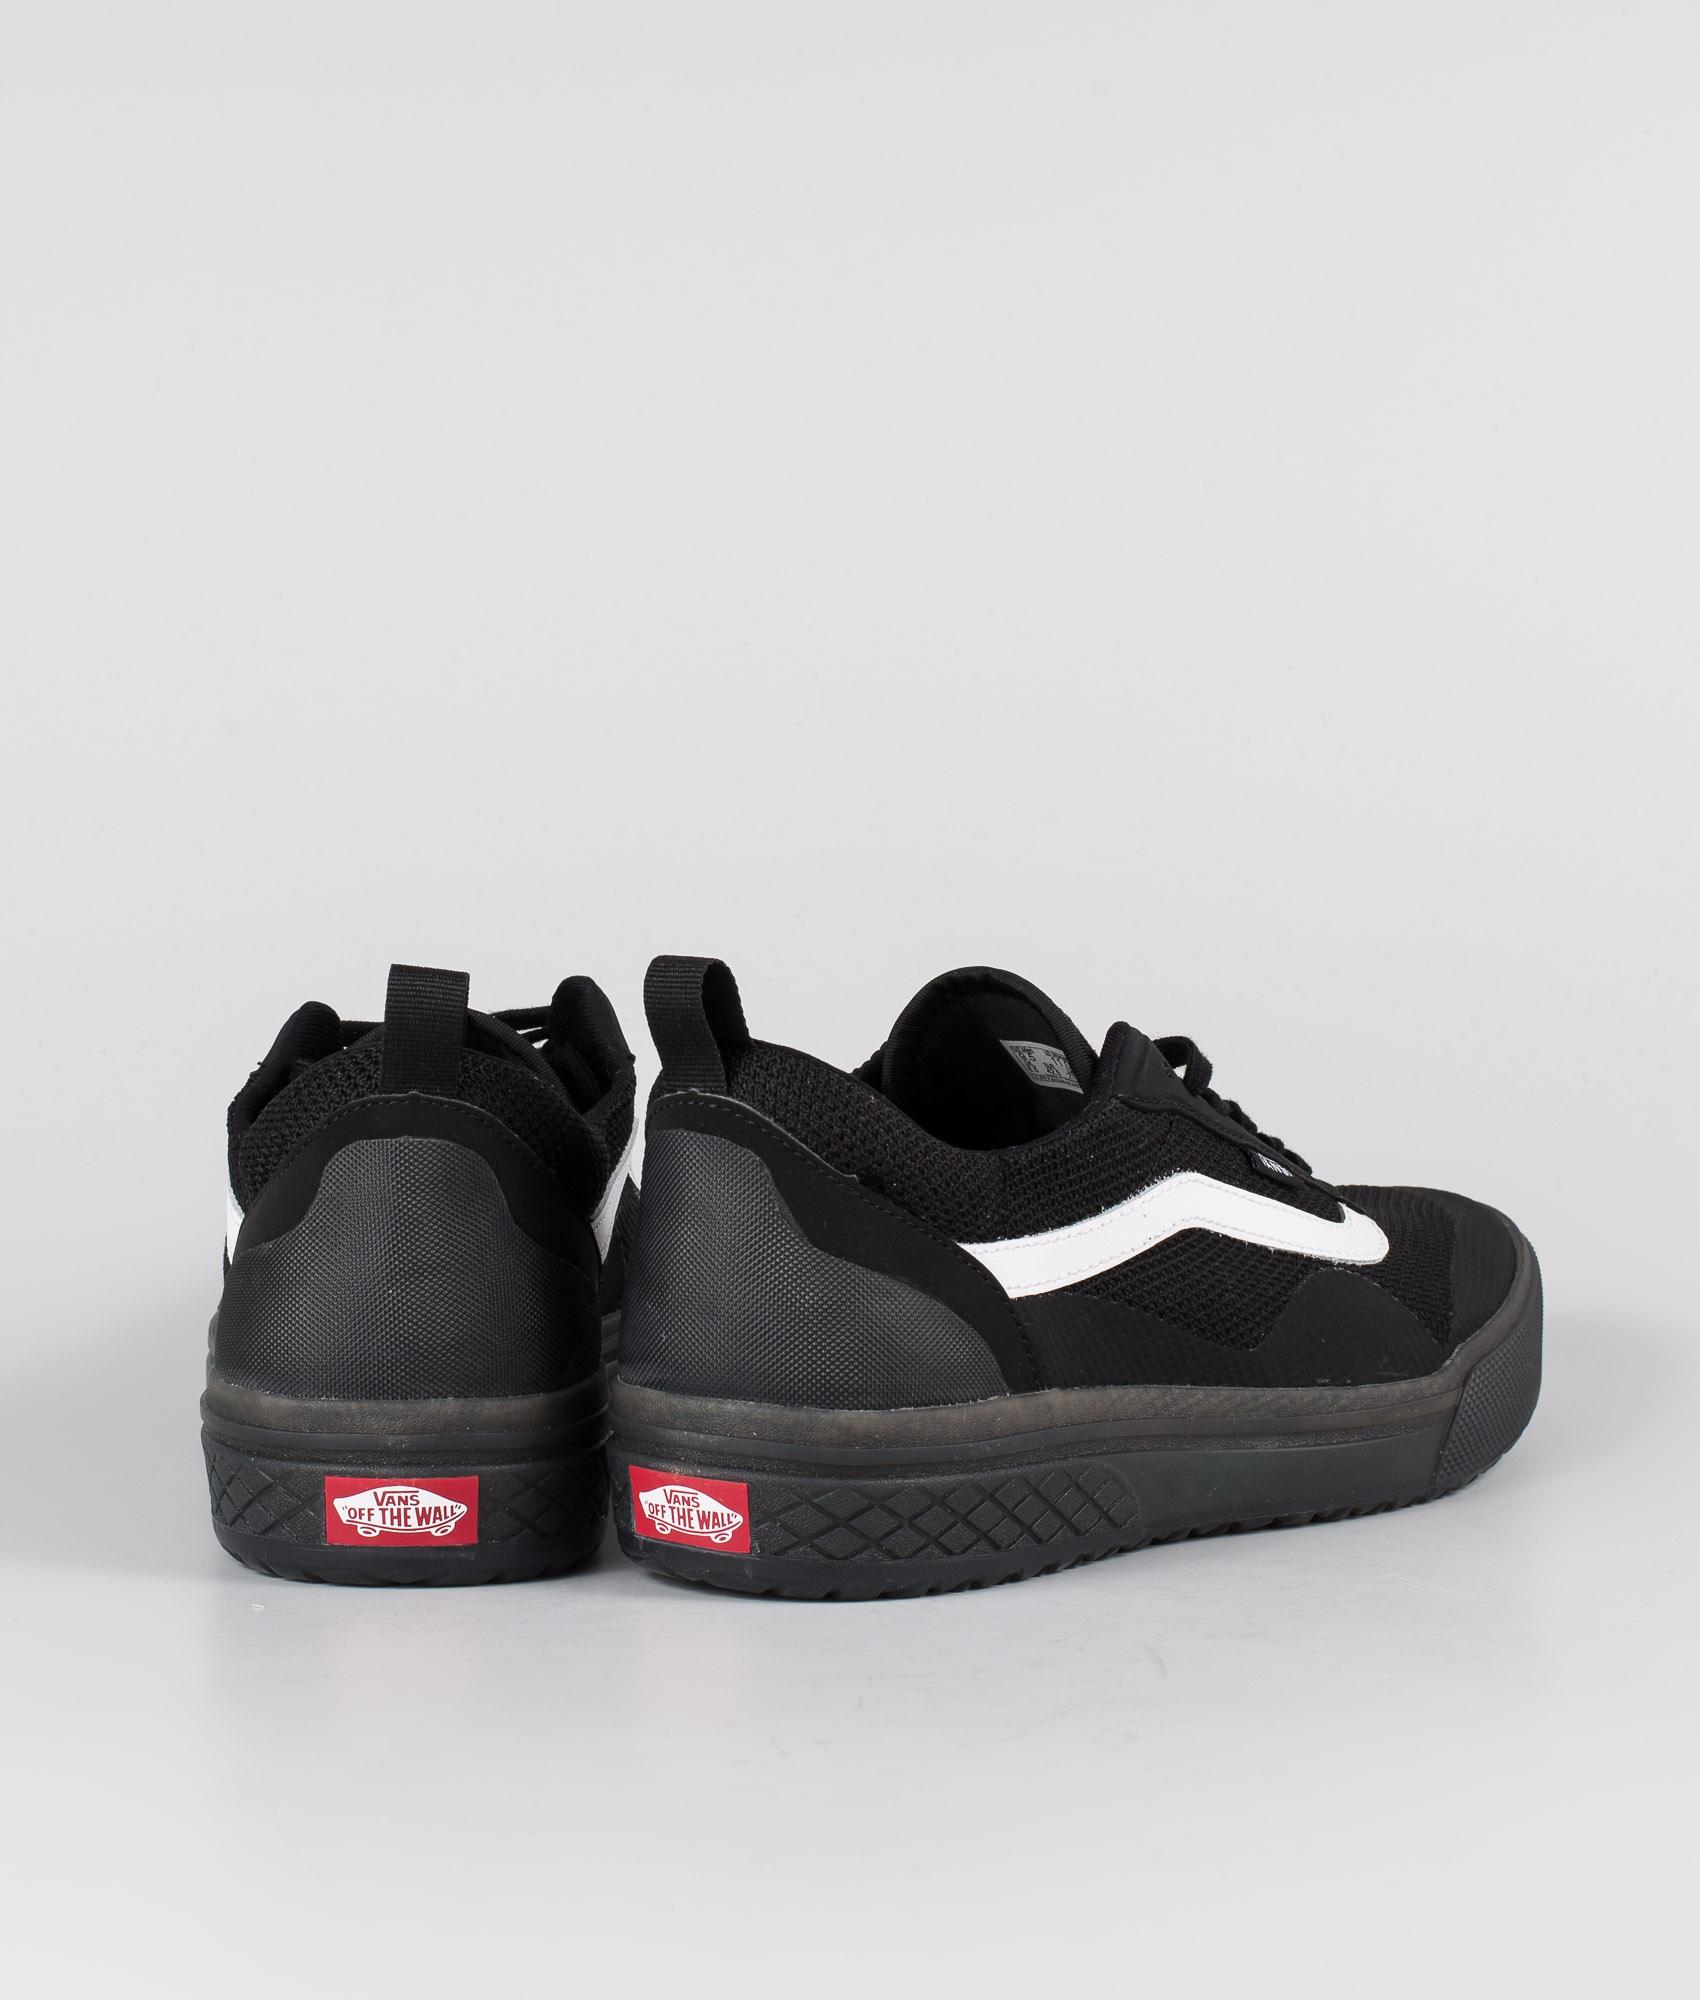 Vans Mod Rapidweld Schuhe BlackSmoke